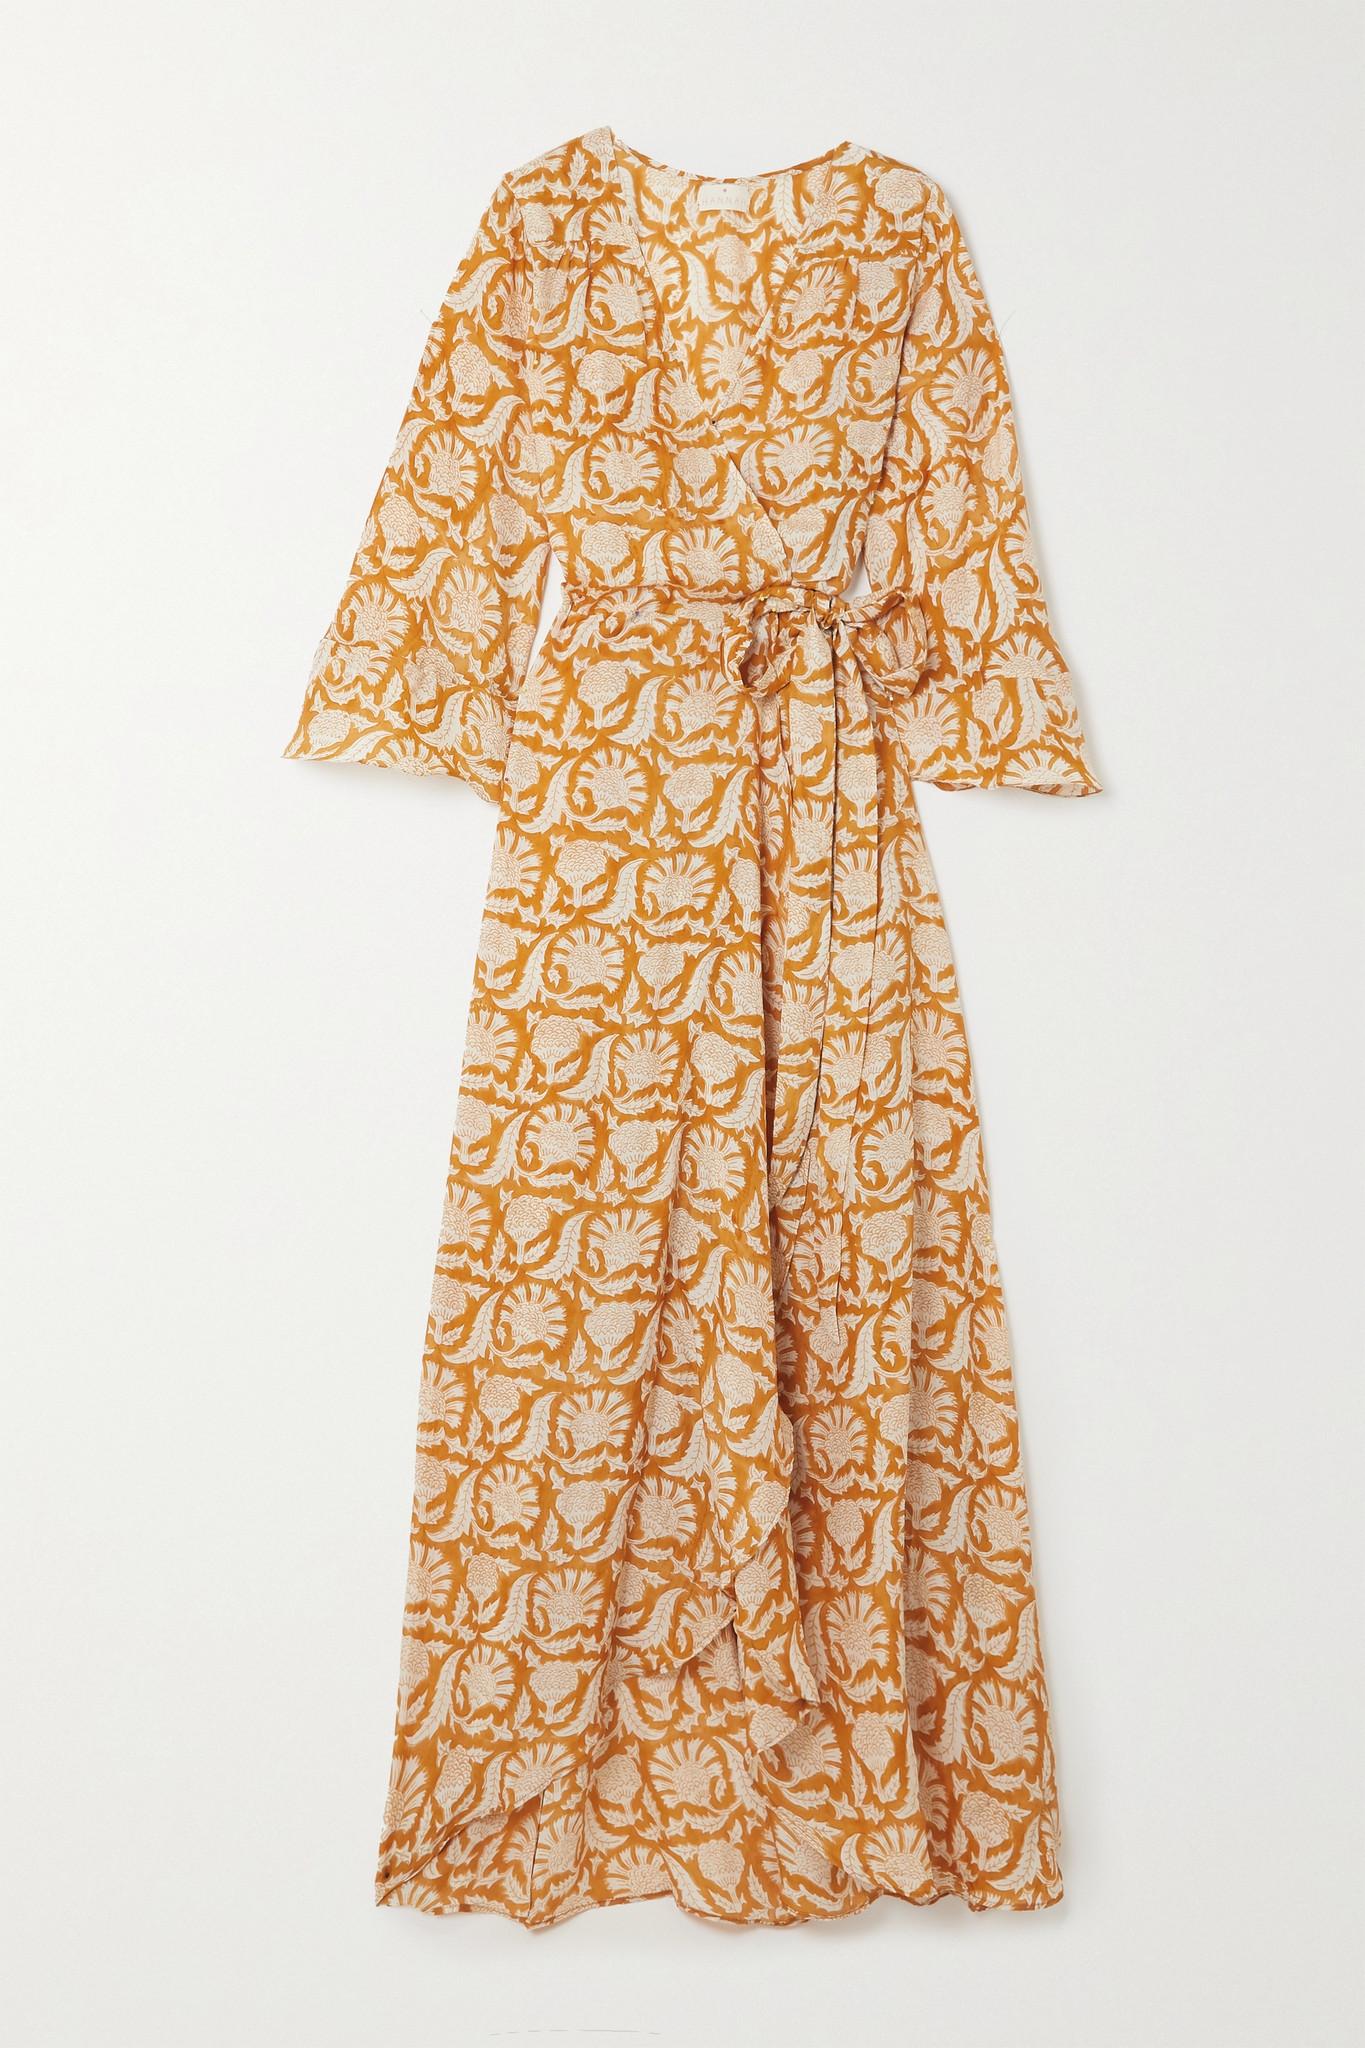 HANNAH ARTWEAR - 【net Sustain】luna 印花真丝超长裹身连衣裙 - 橙色 - One size